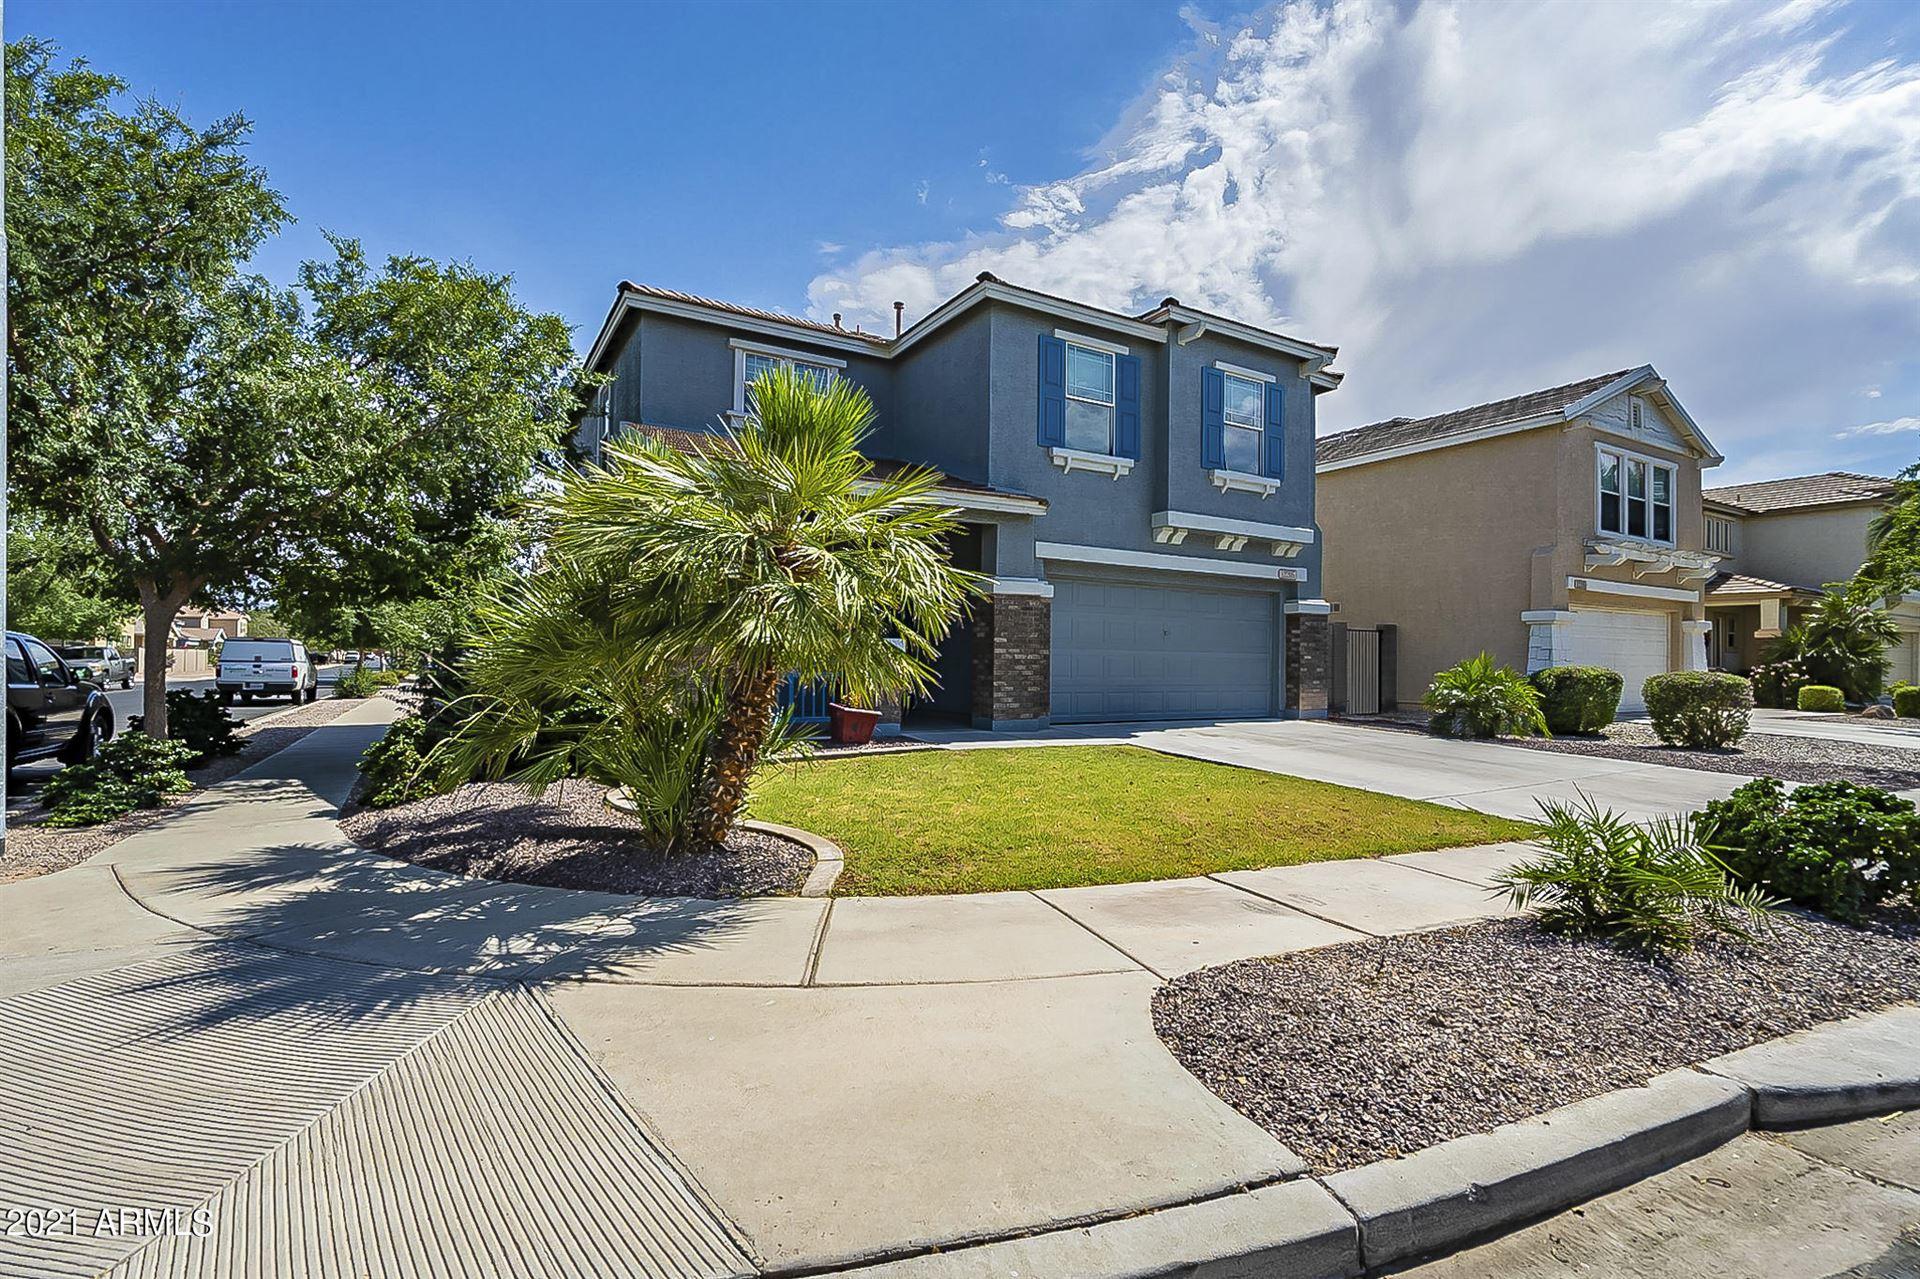 Photo of 12205 W FLANAGAN Street, Avondale, AZ 85323 (MLS # 6246559)